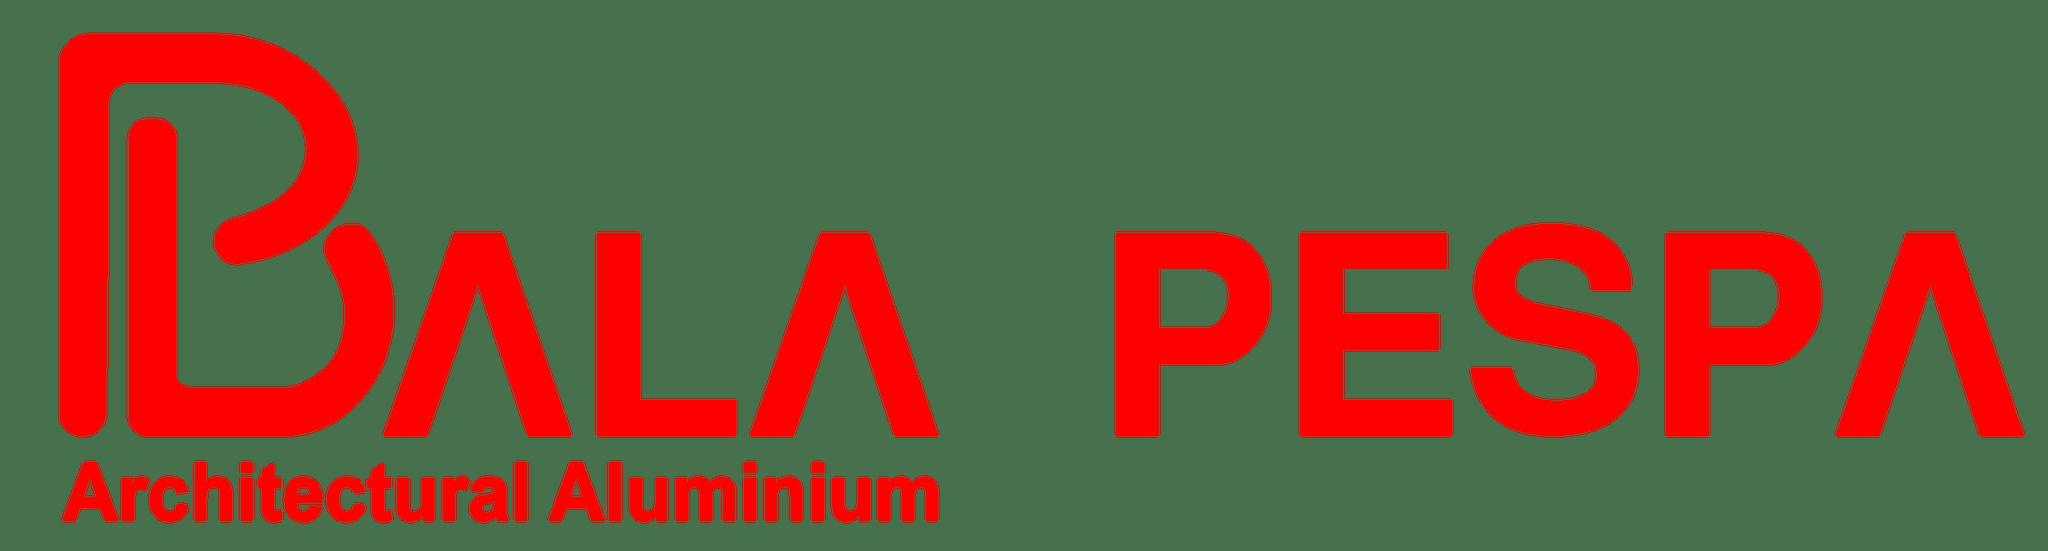 Bala Pespa Ltd